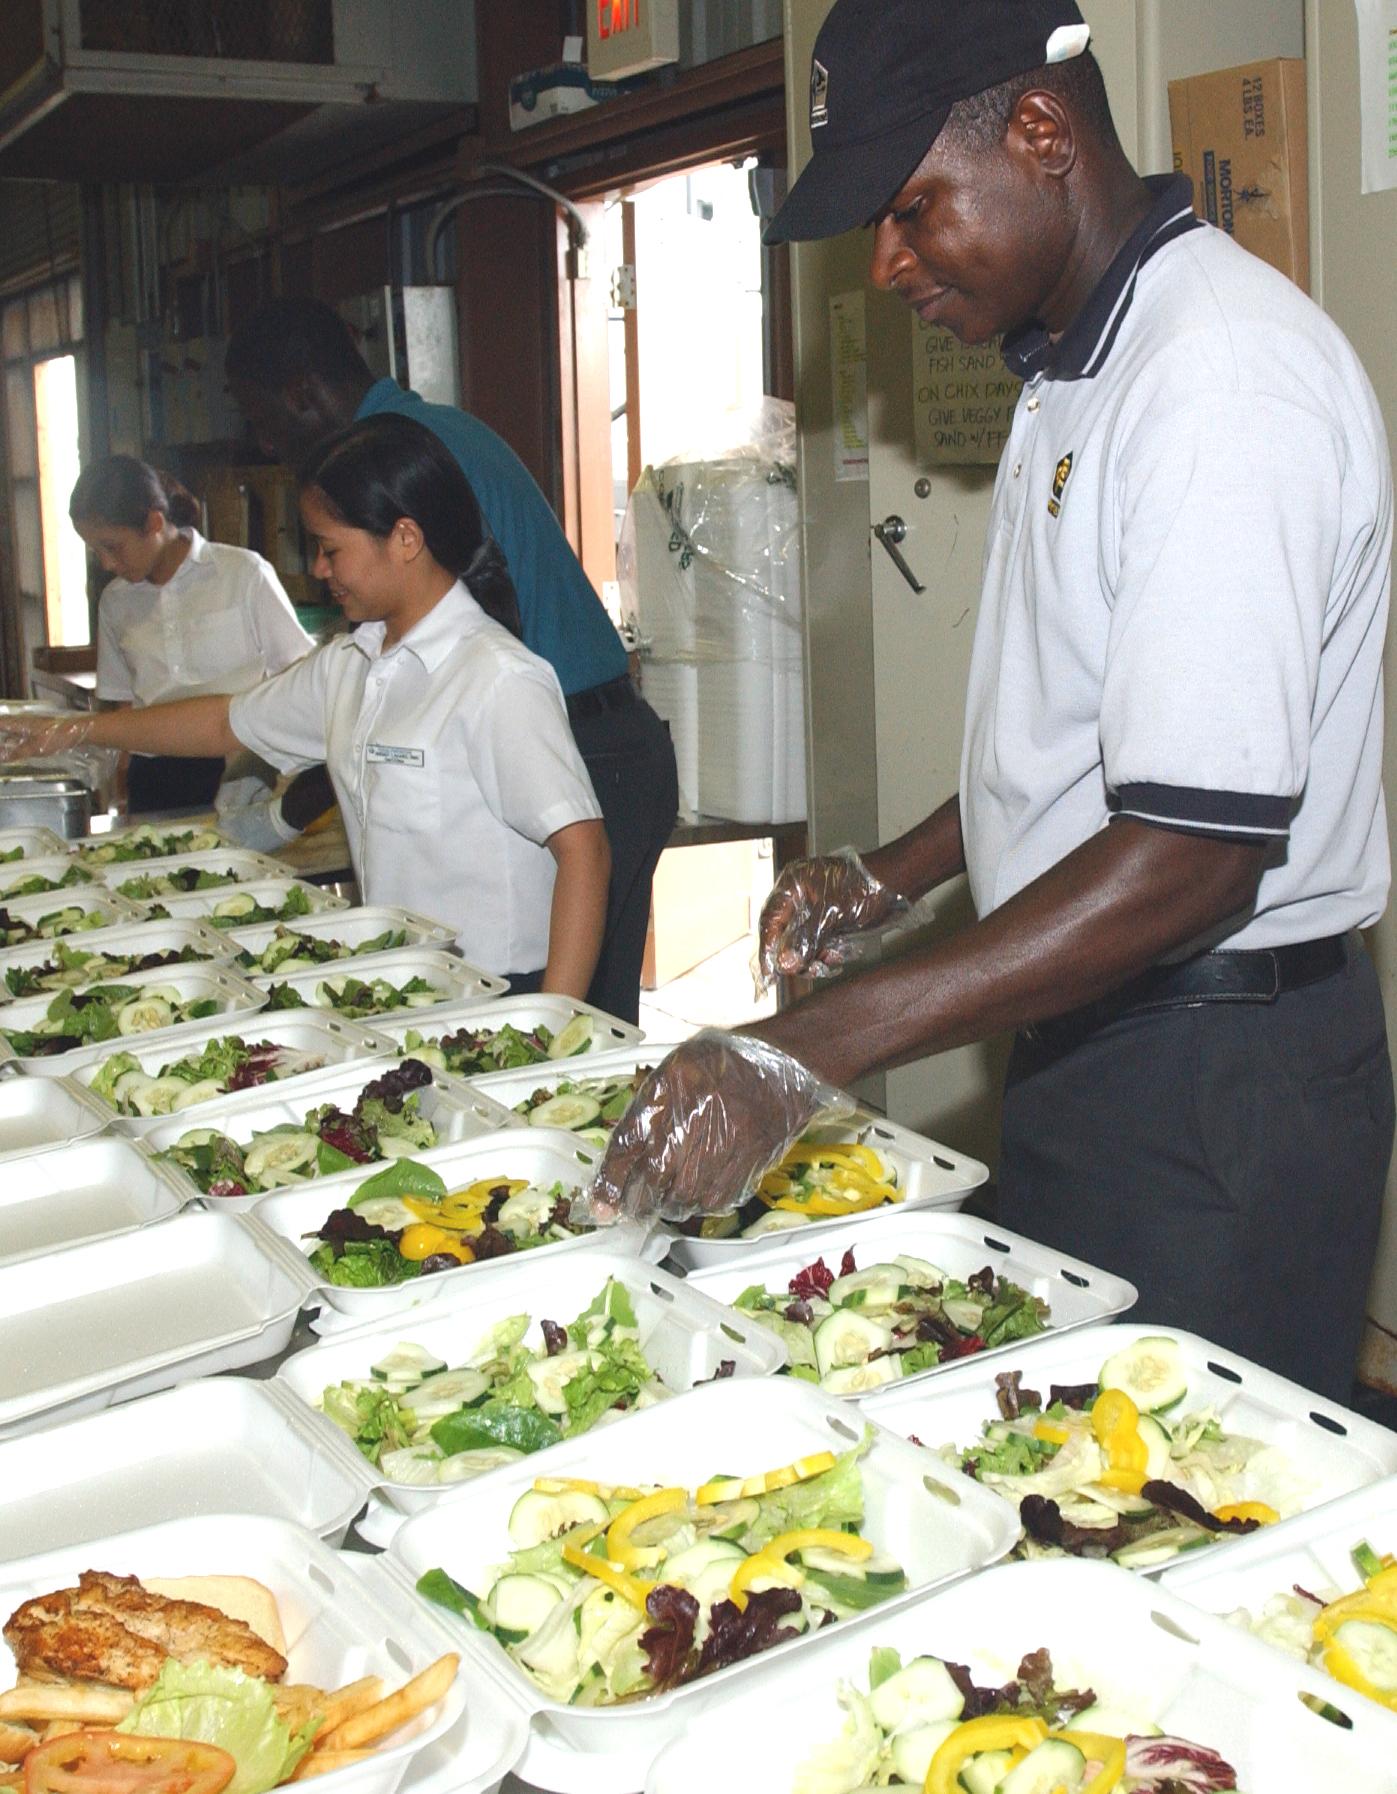 Food service cookware